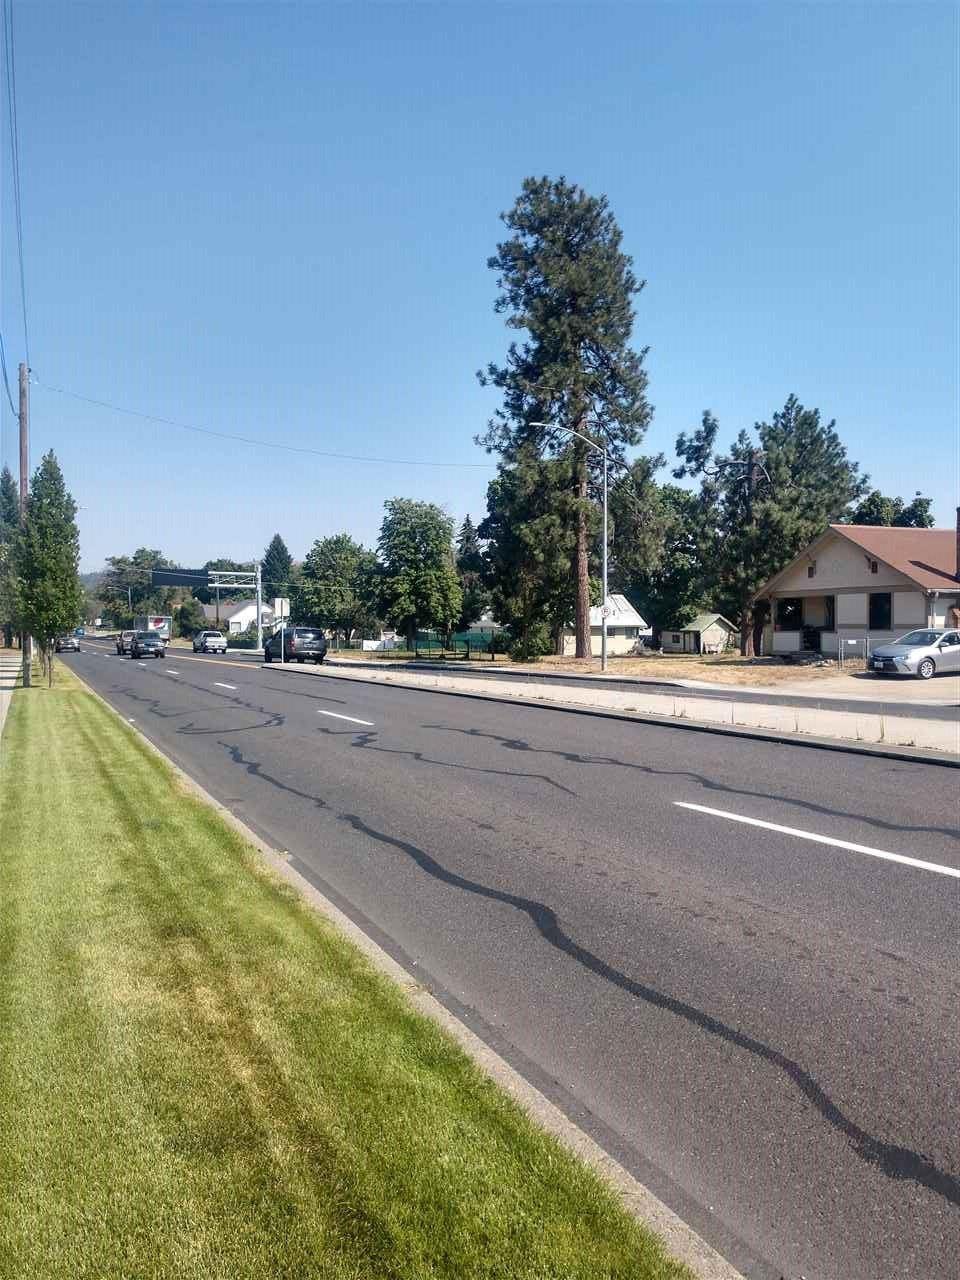 2214 E Francis Ave, Spokane, WA 99217 - #: 202110075